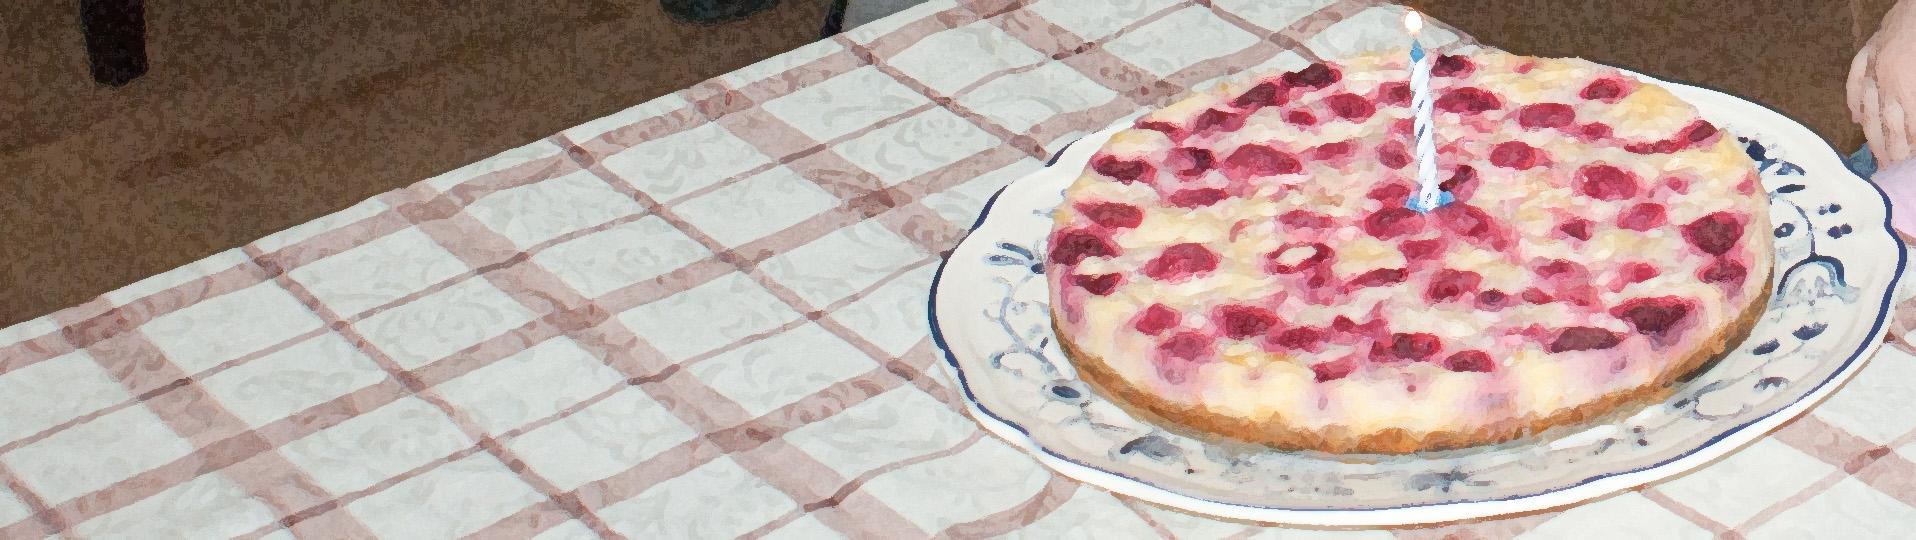 torta_cut.jpg